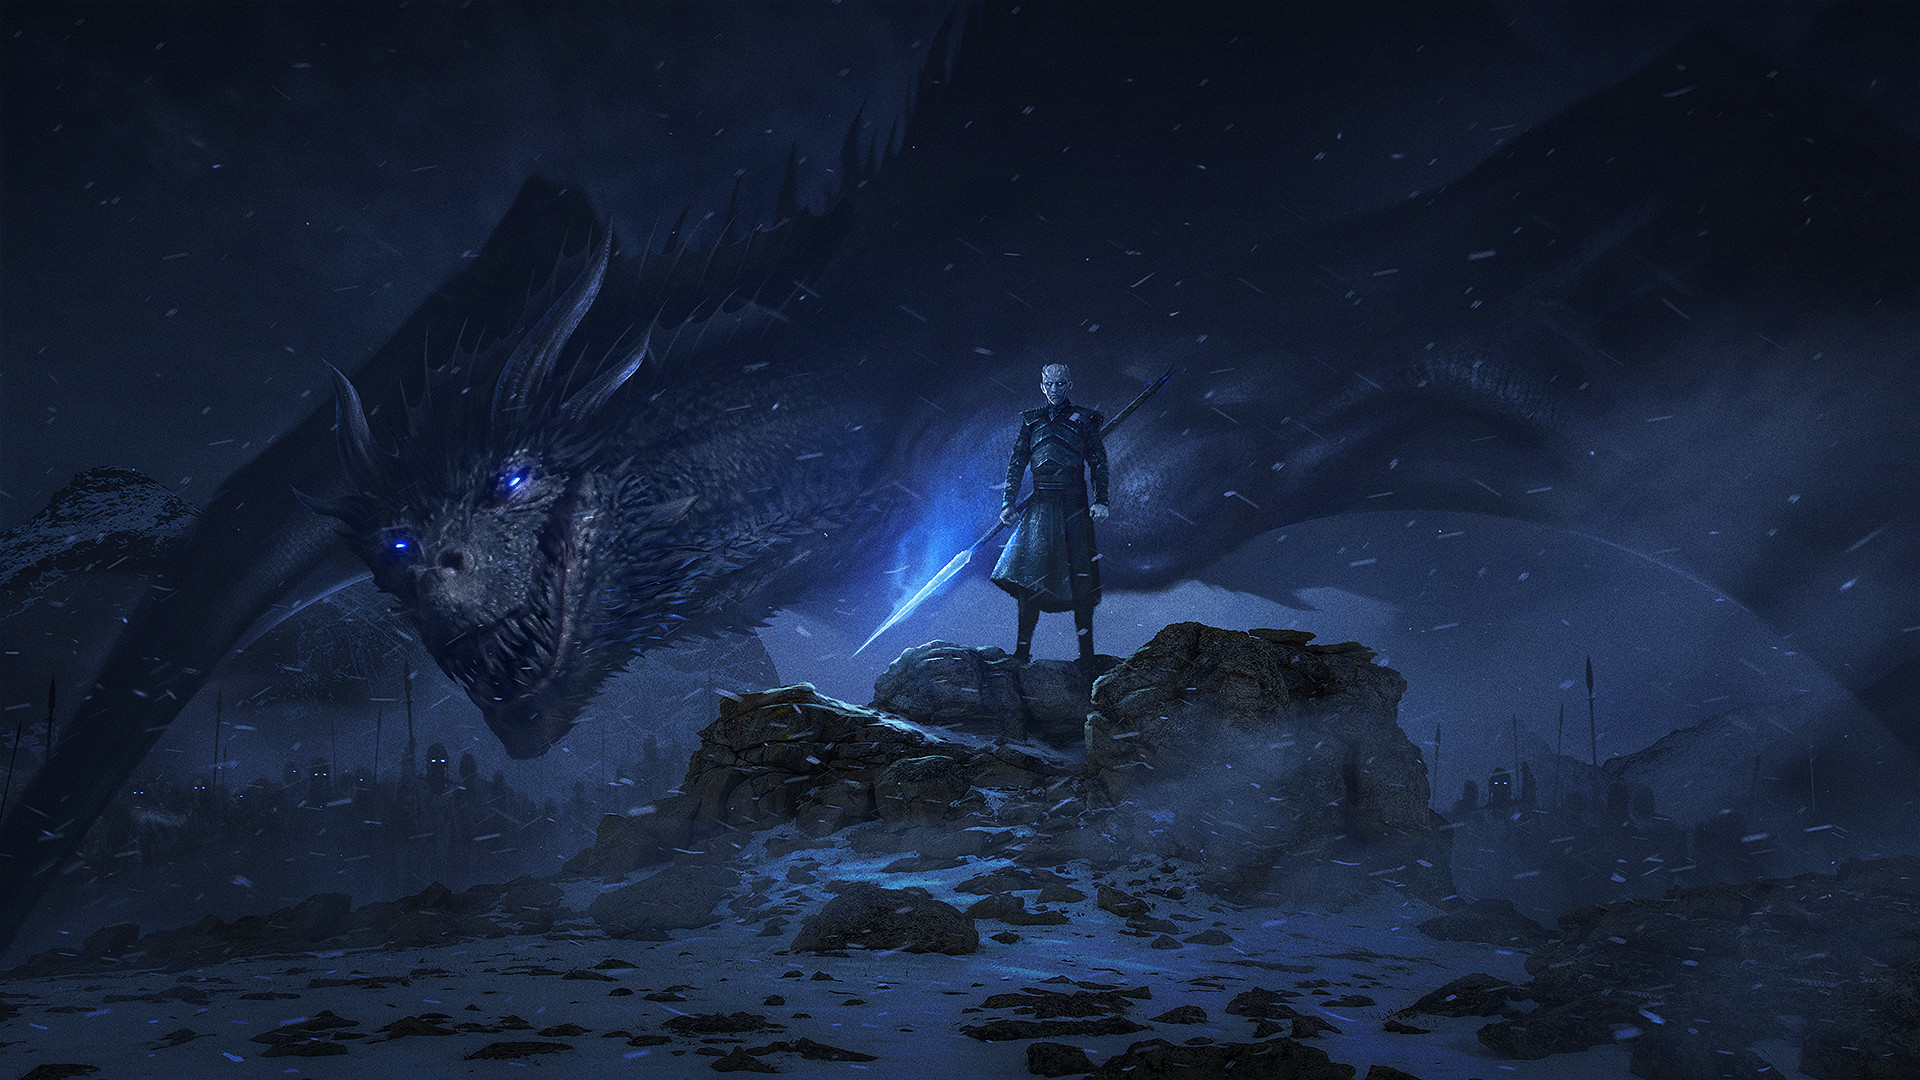 15 Game Of Thrones Season 7 Wallpapers On Wallpapersafari